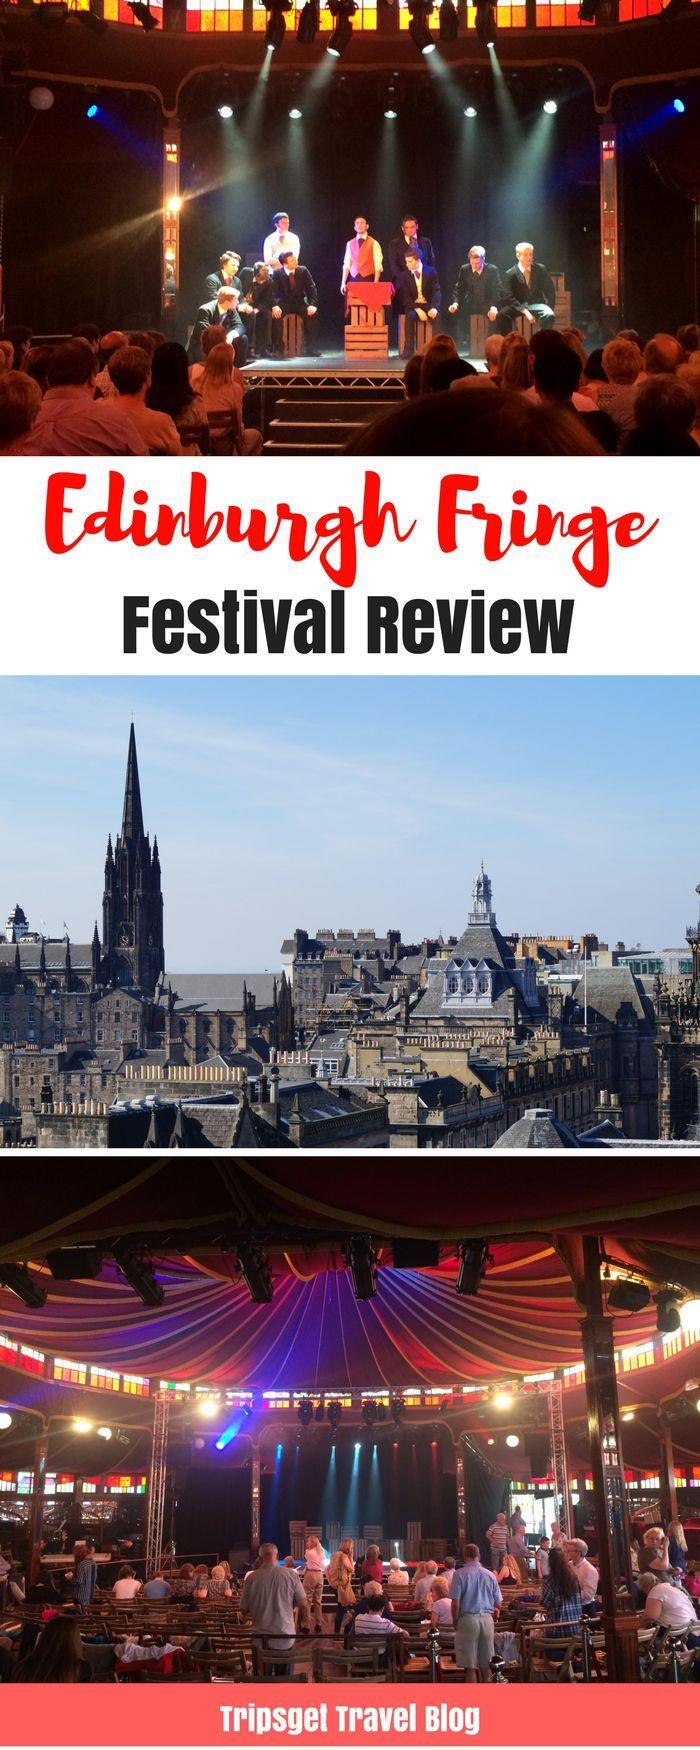 Edinburgh Fringe Festival review. Is it really worth it?